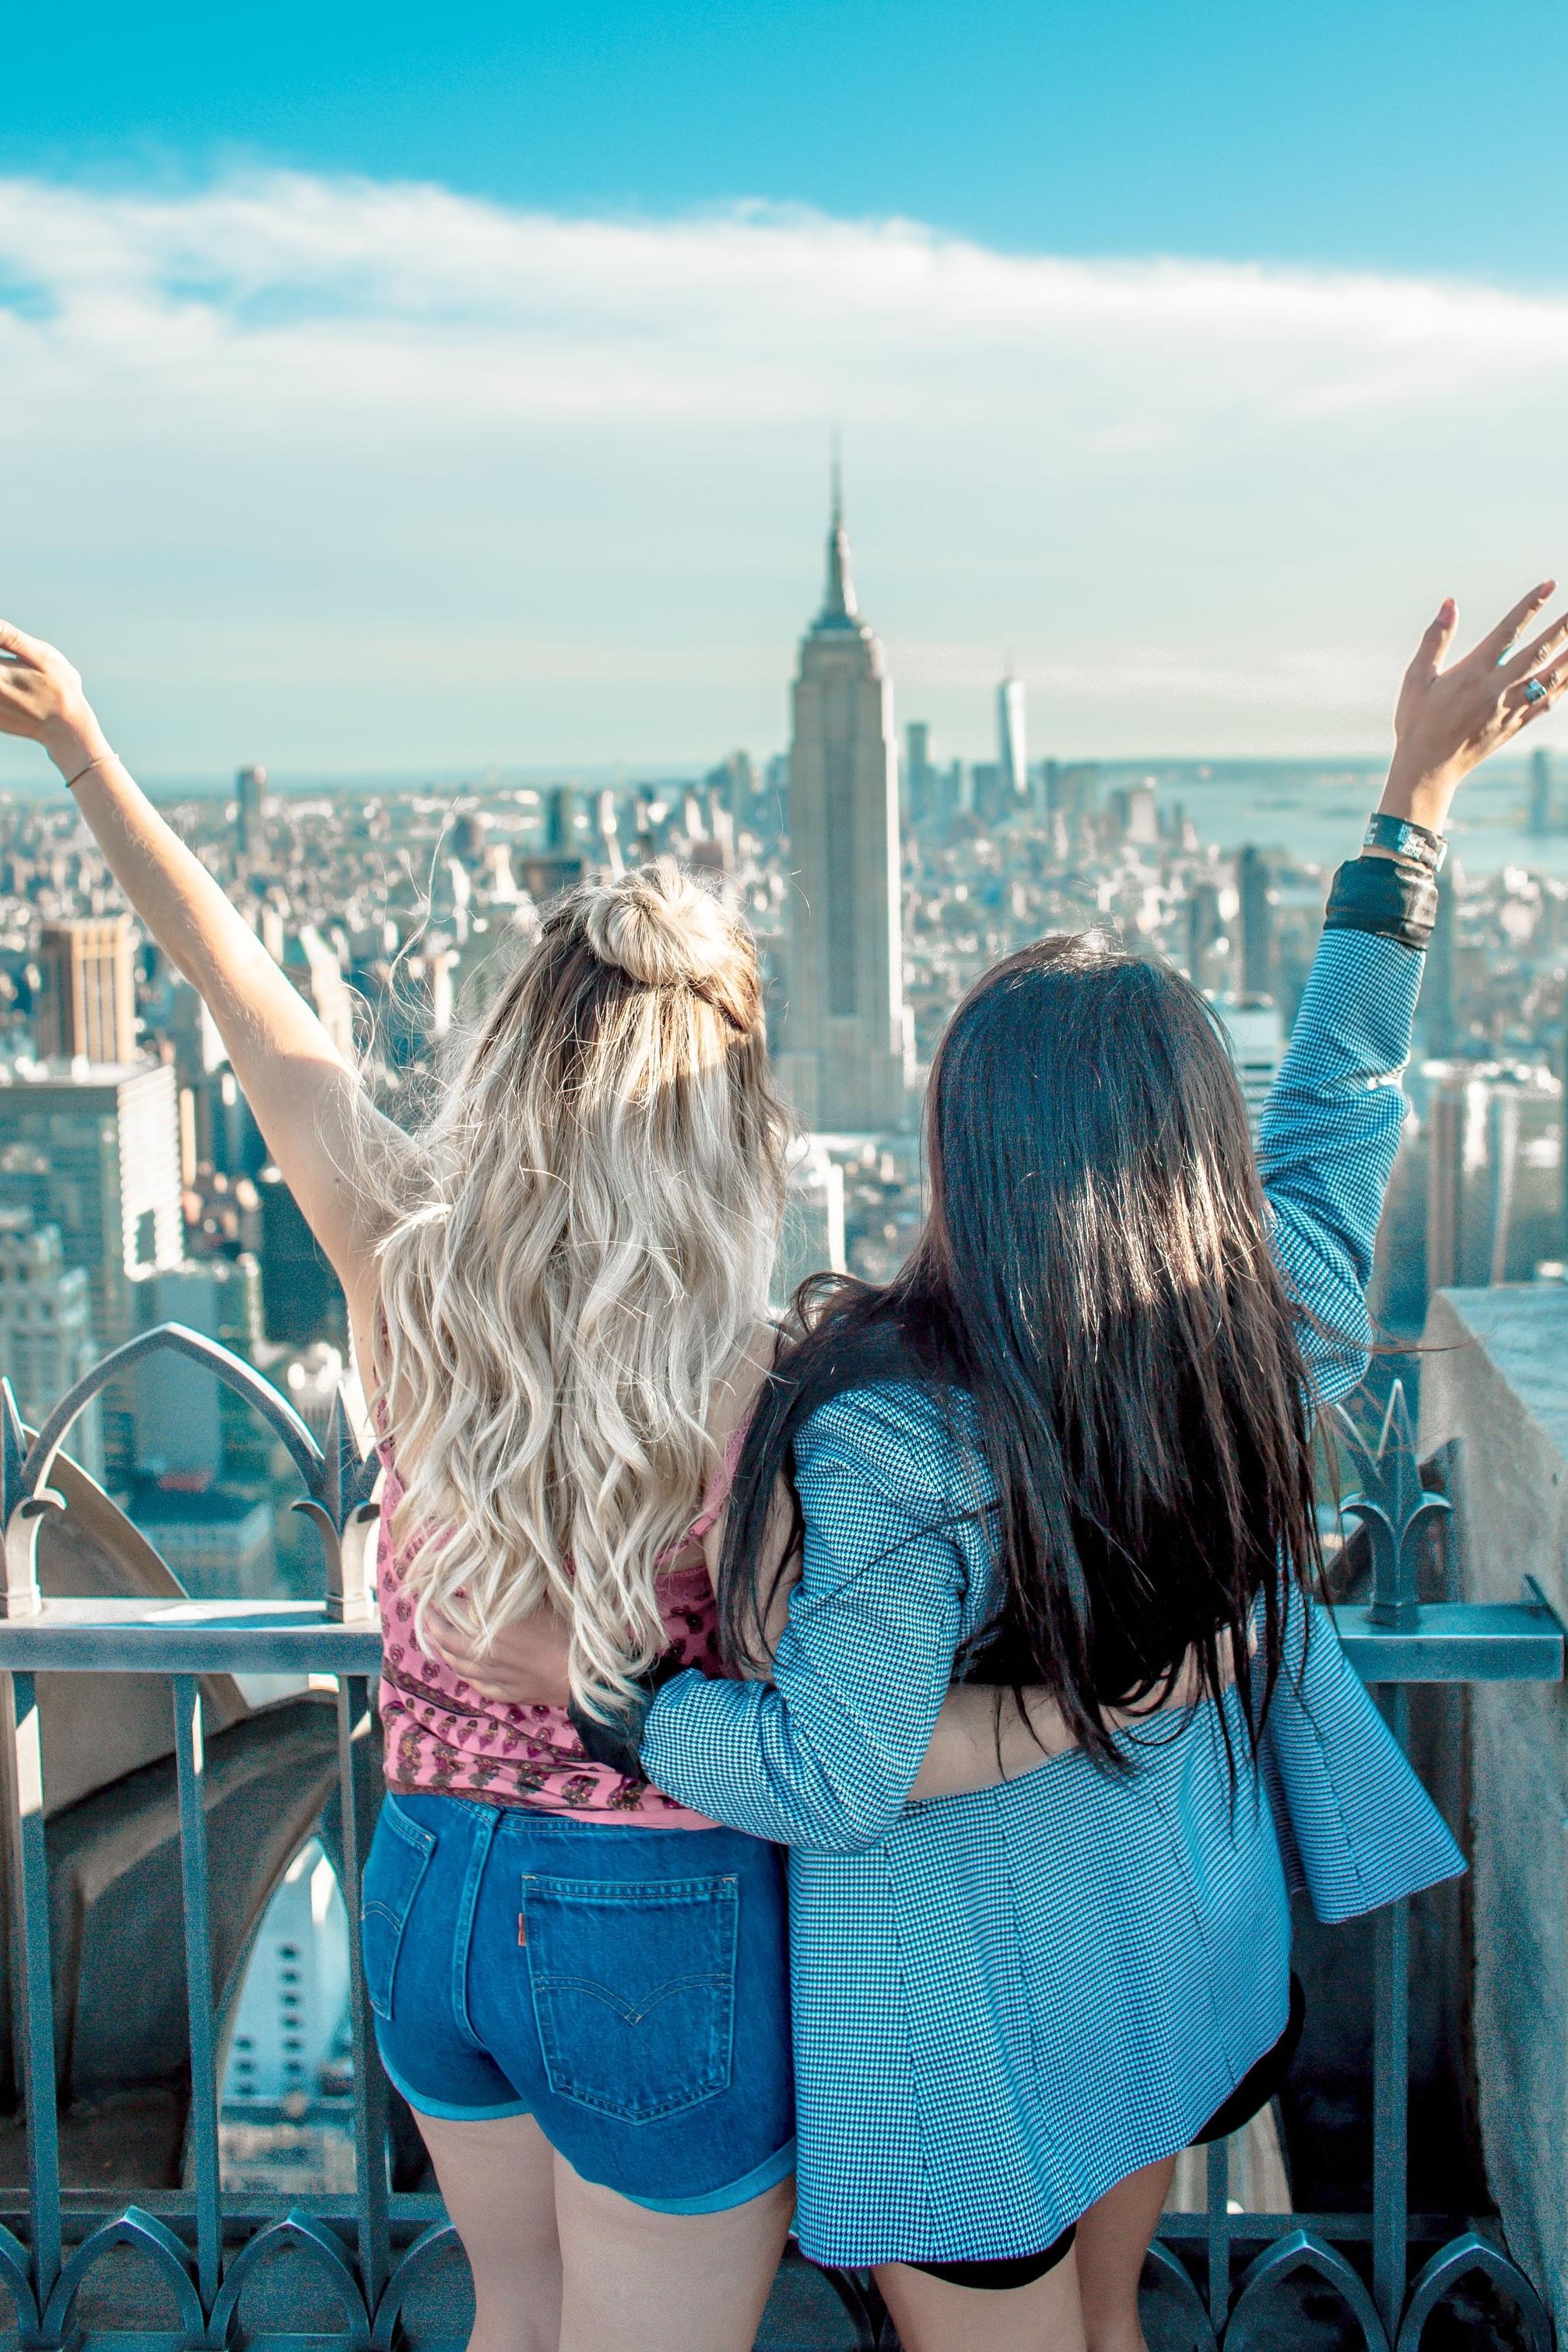 New York City - Peak Season: Apr-NovVibe: #BarScene #ClubScene #City #Culture #Arts #FoodieCOMING SOON!